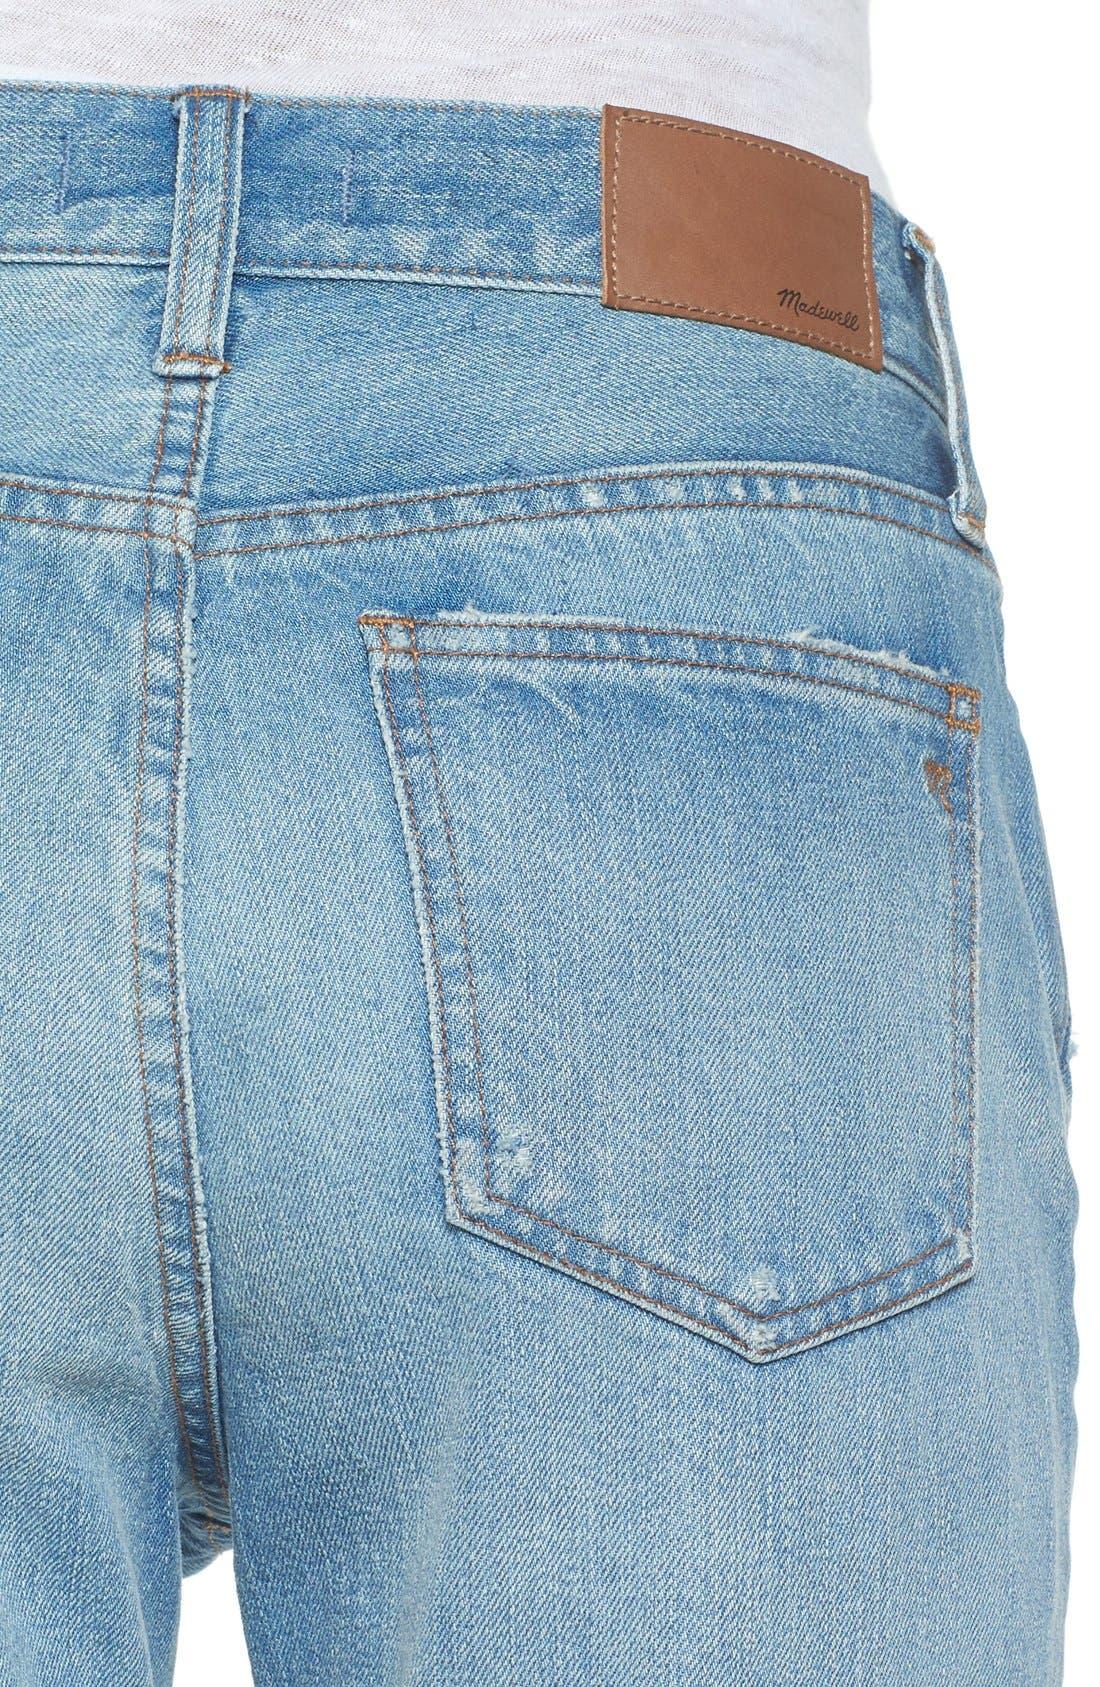 Alternate Image 4  - Madewell Perfect Vintage Ripped High Waist Boyfriend Jeans (Chet)